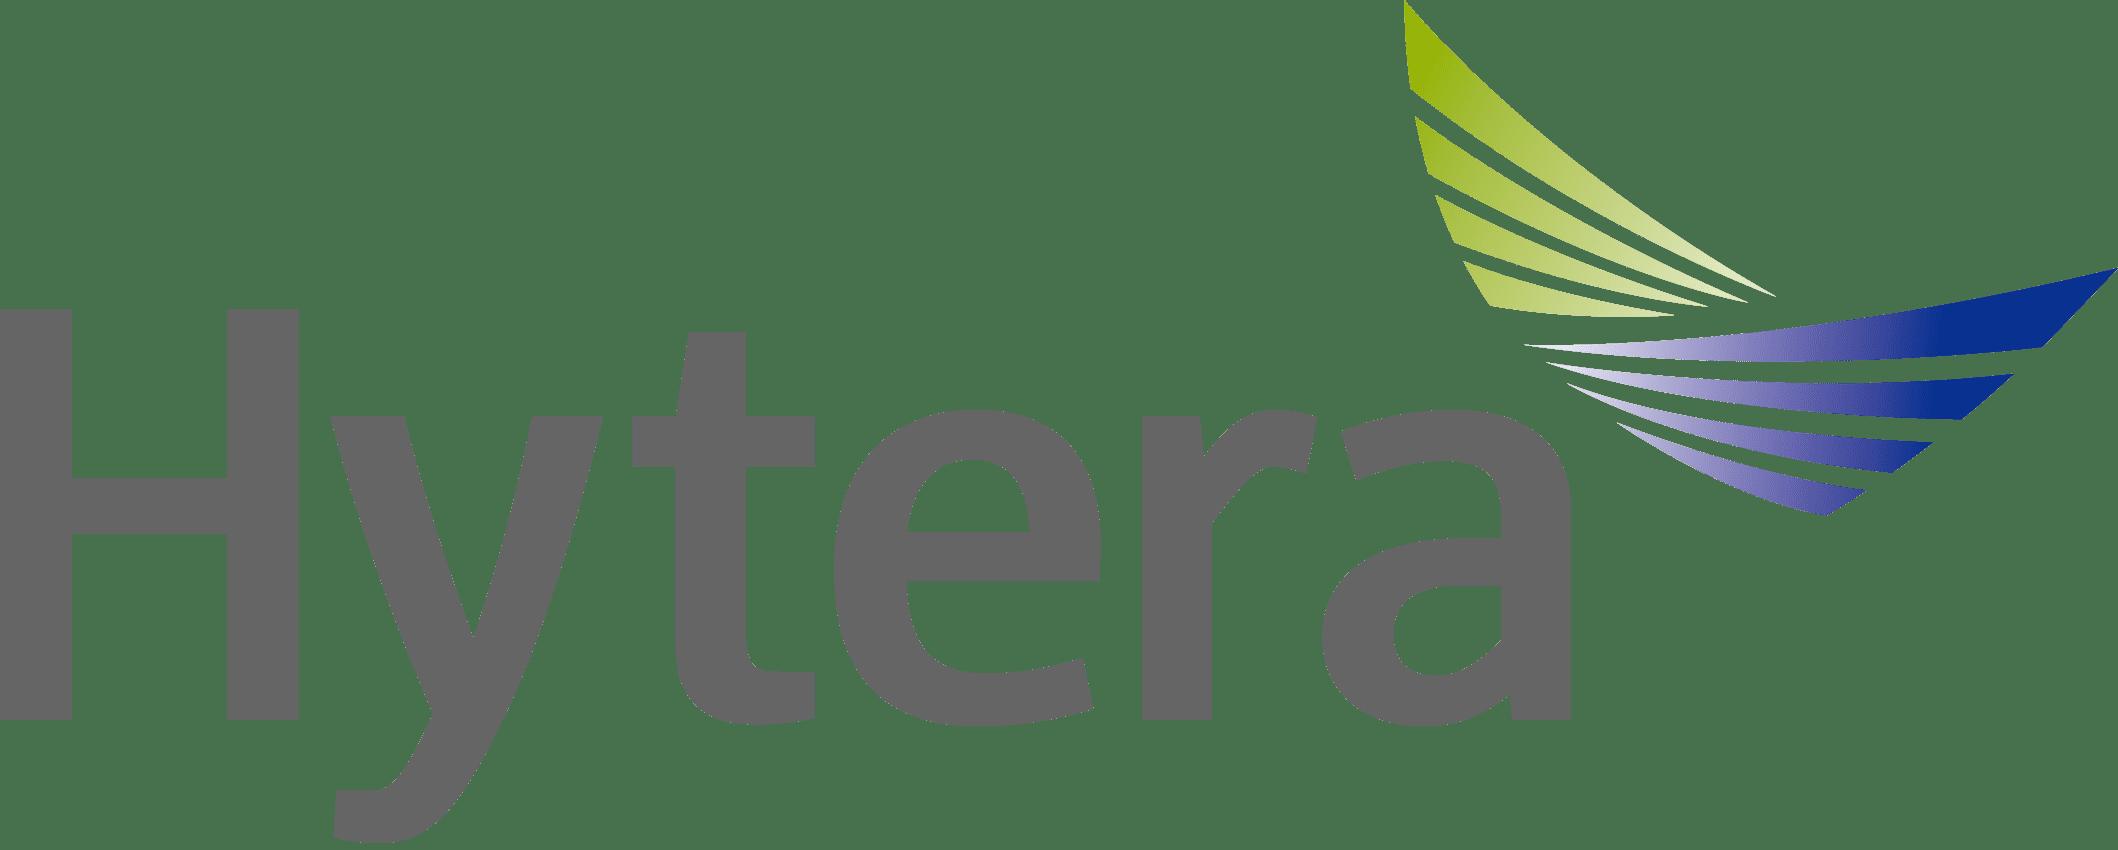 hytera-transparent-3